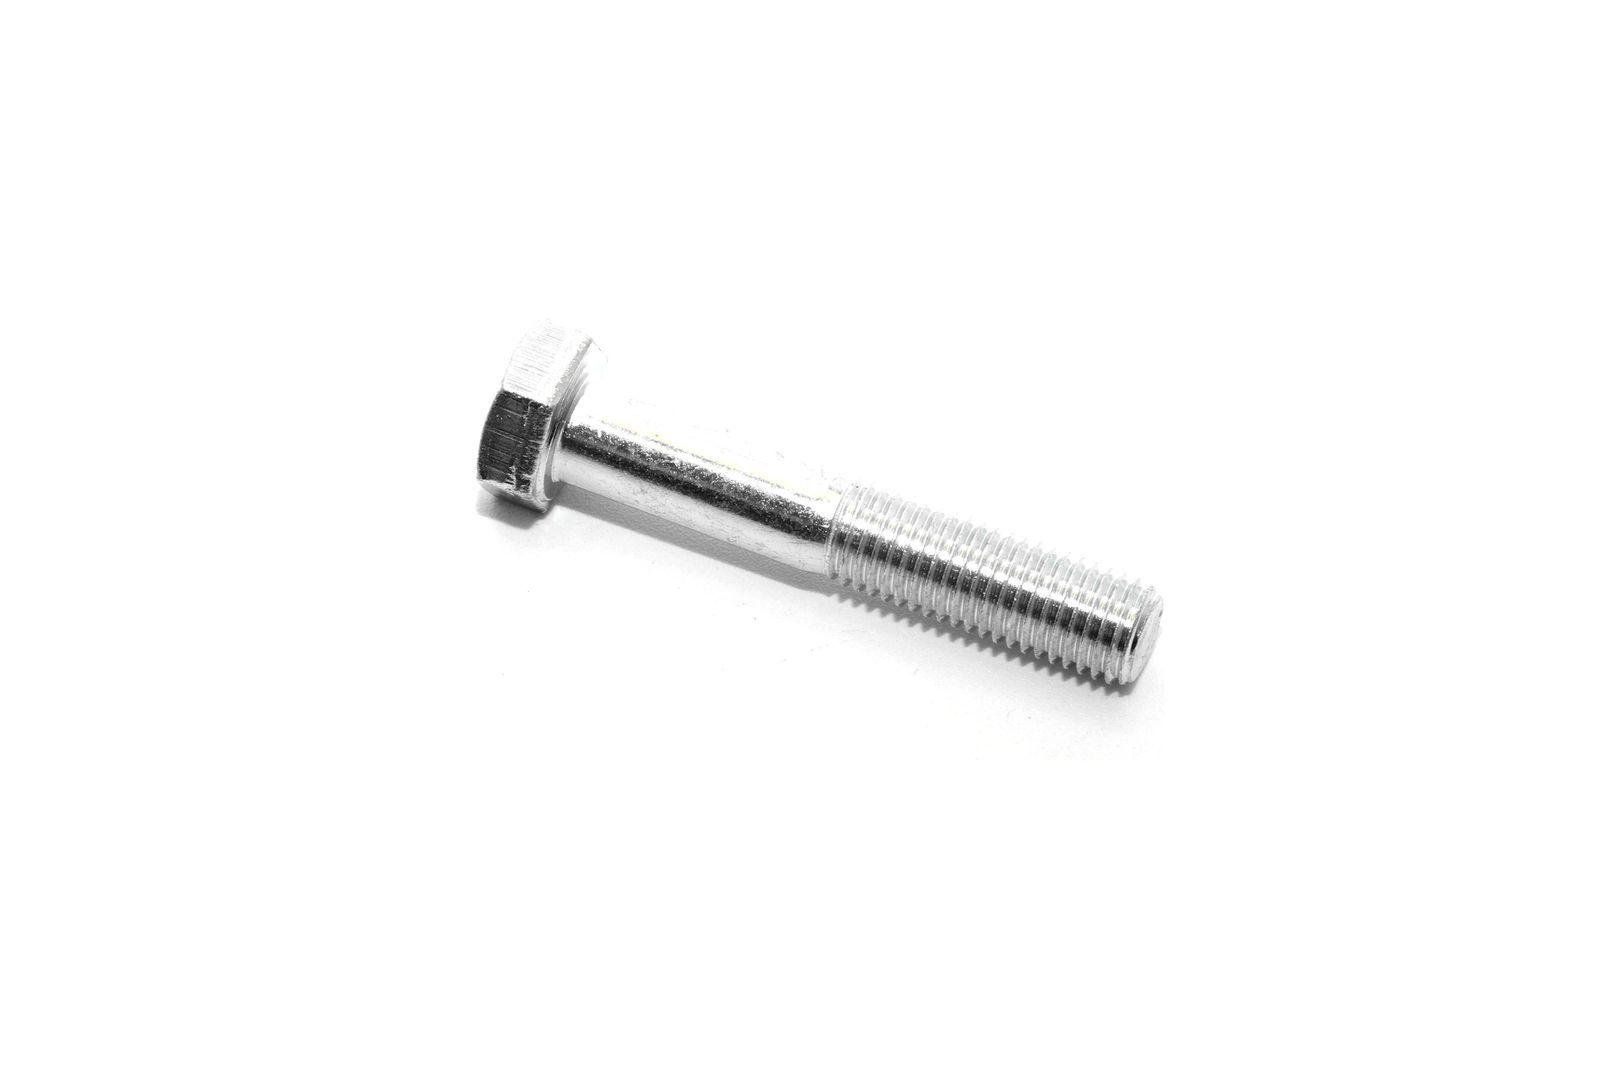 "#1002-20 Bolzen UNF 5/16"" x 1 3/4"", BH605141"